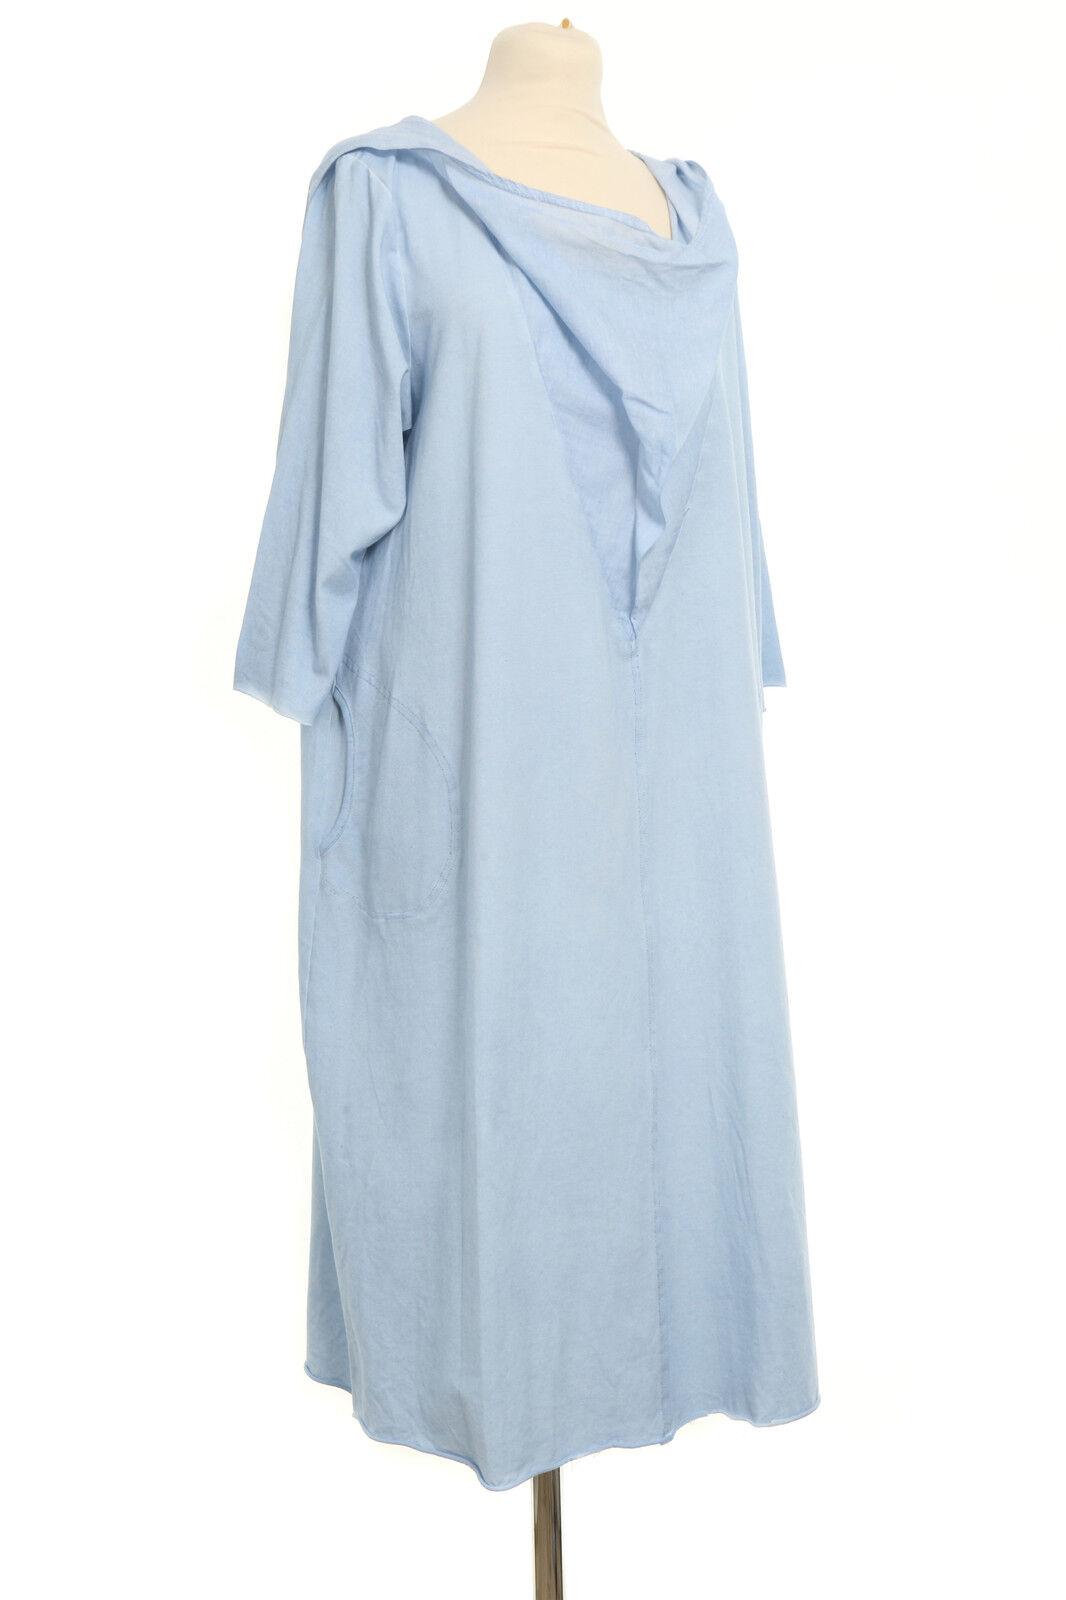 Fabulous Italian Designer Brand Luukaa - Quirky hooded dress